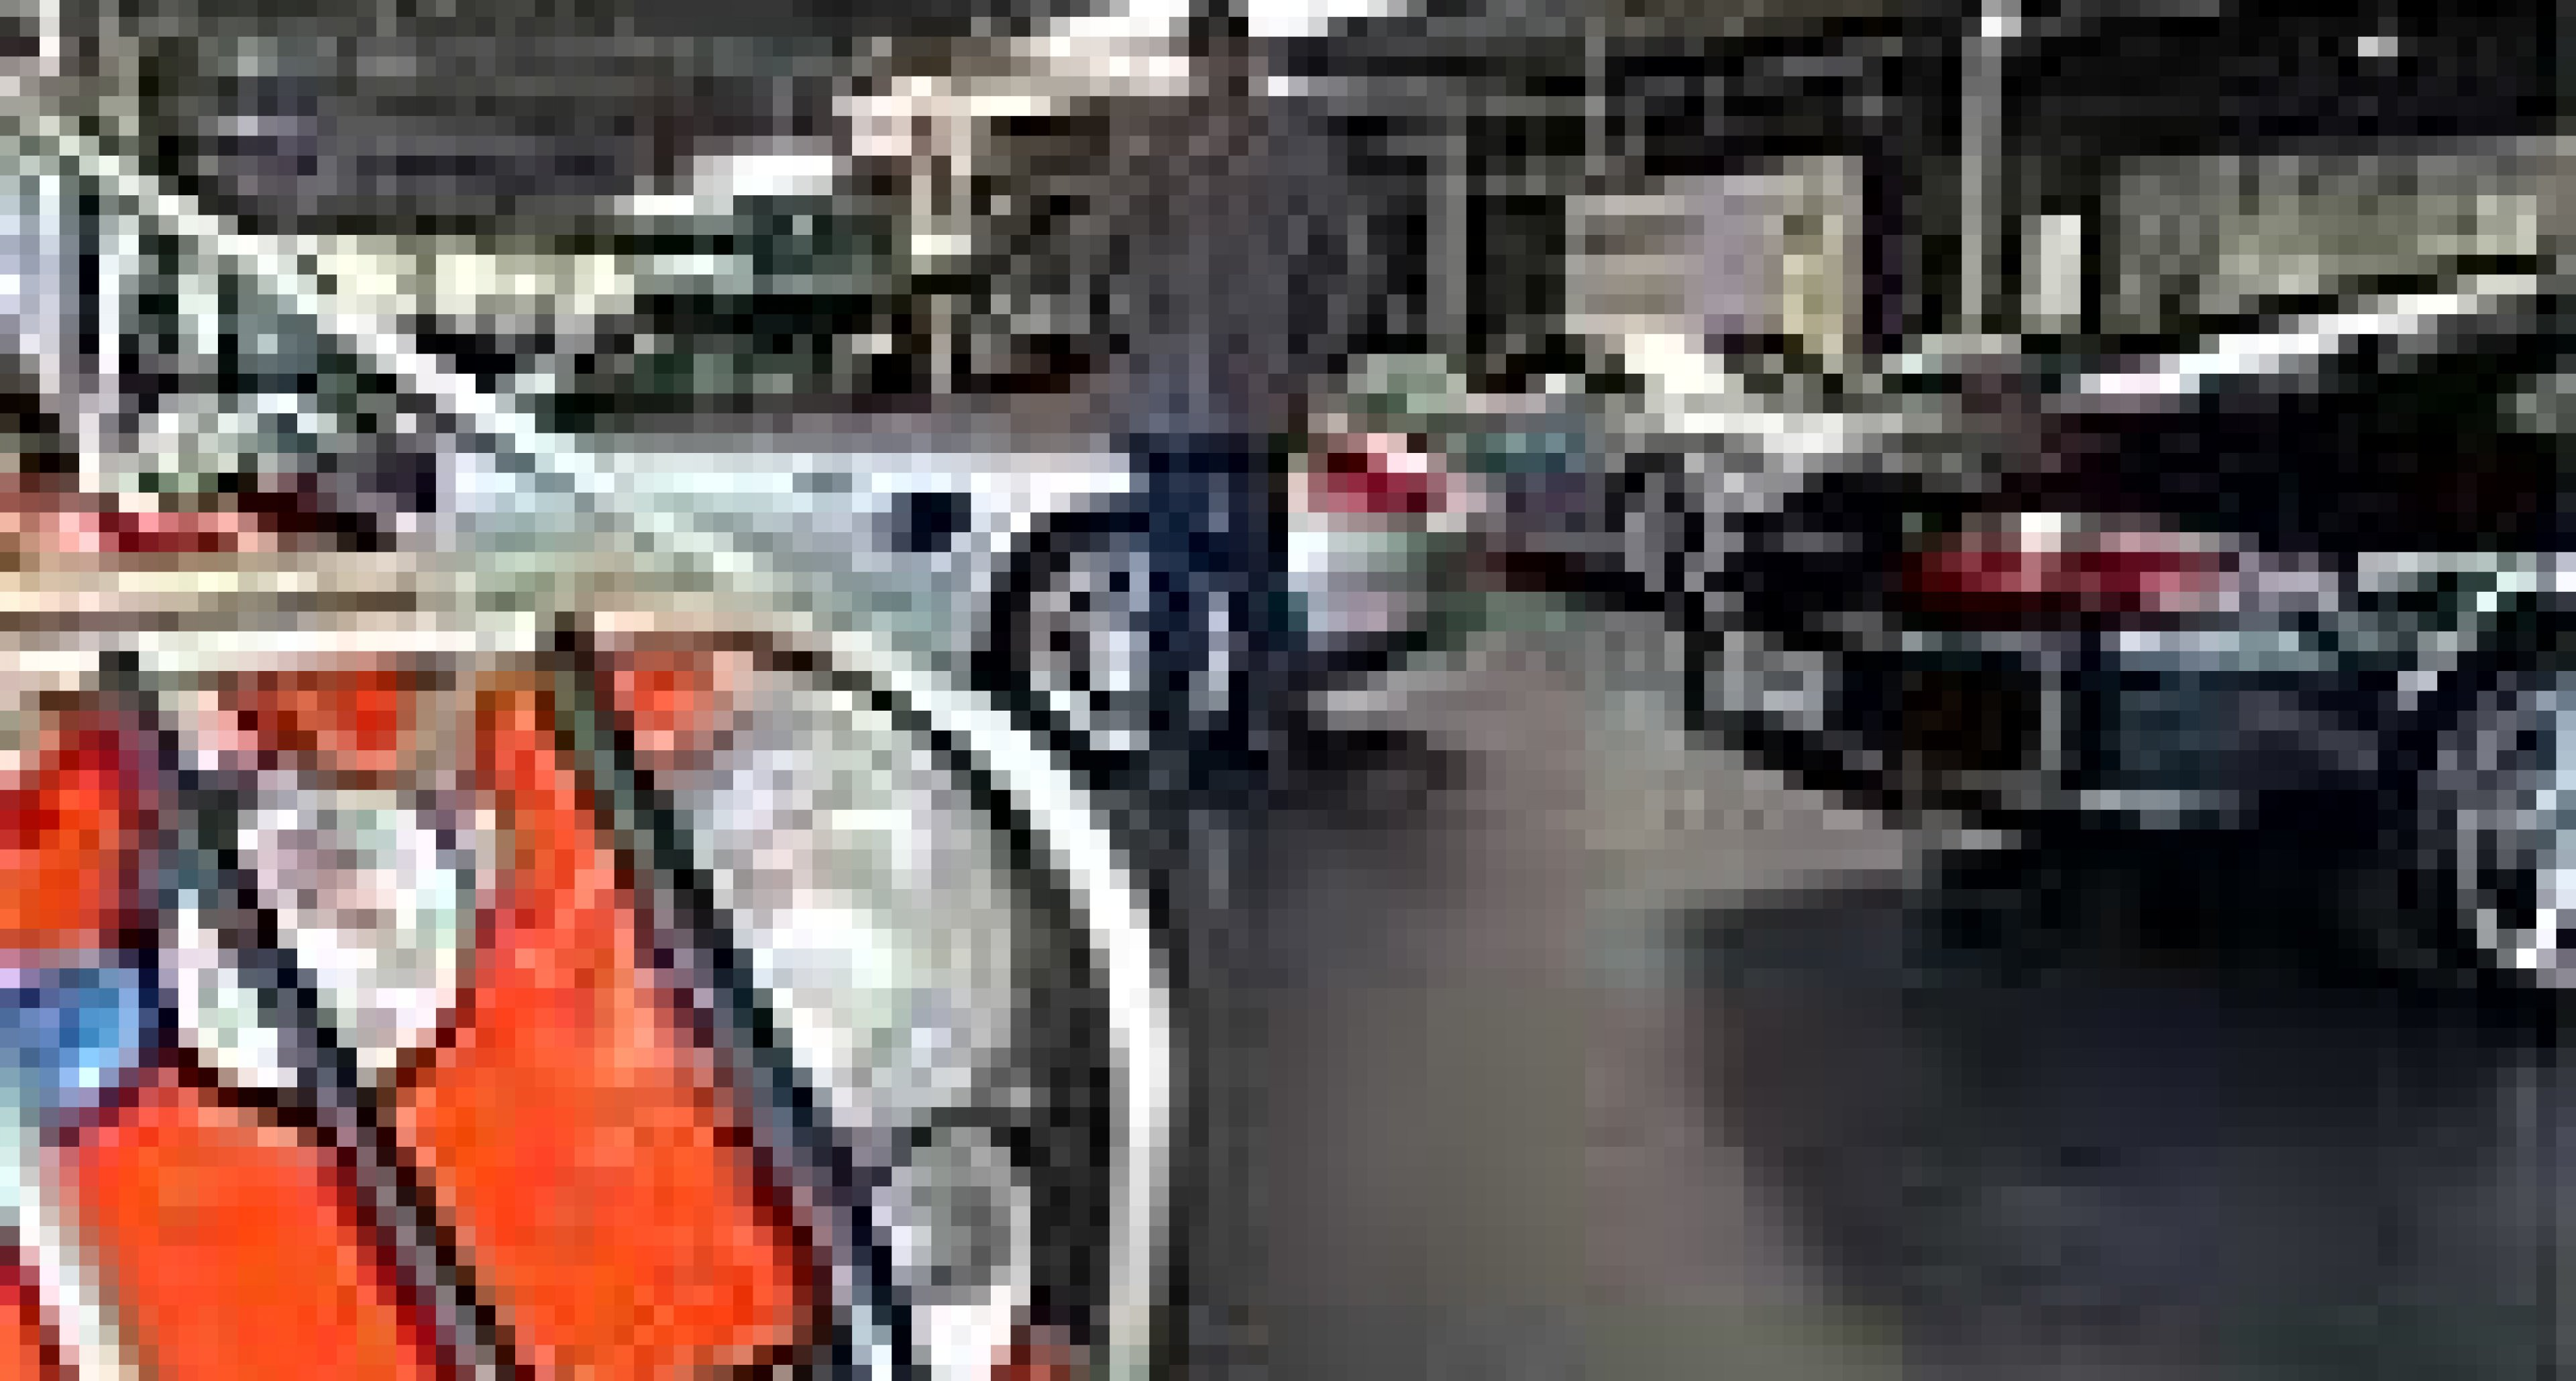 Porsche Zentren Hamburg: Business Profil